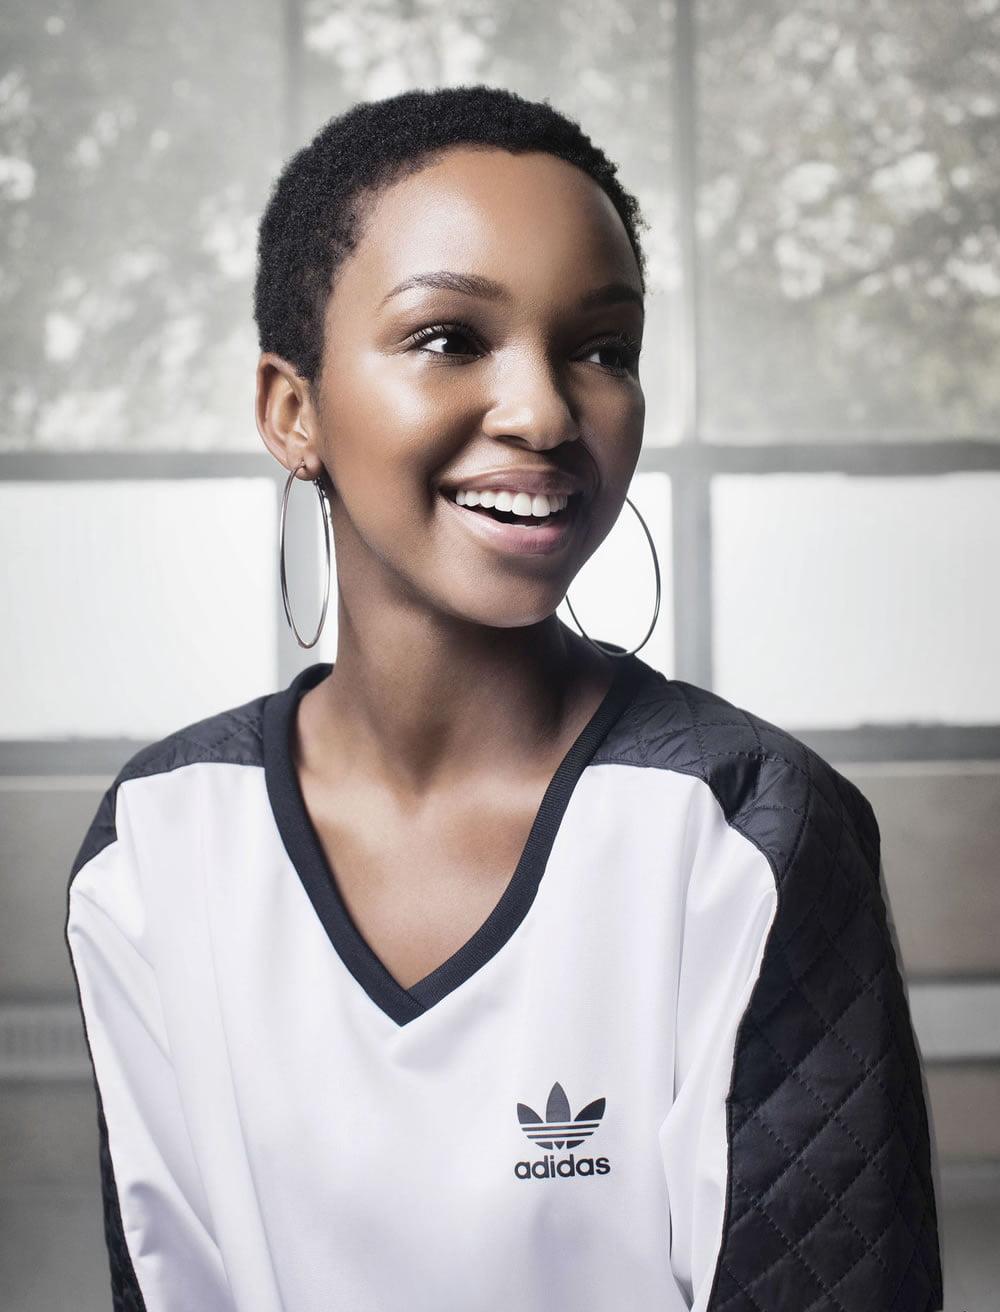 Natural short hair cut image for black women 2019 - Hair ...